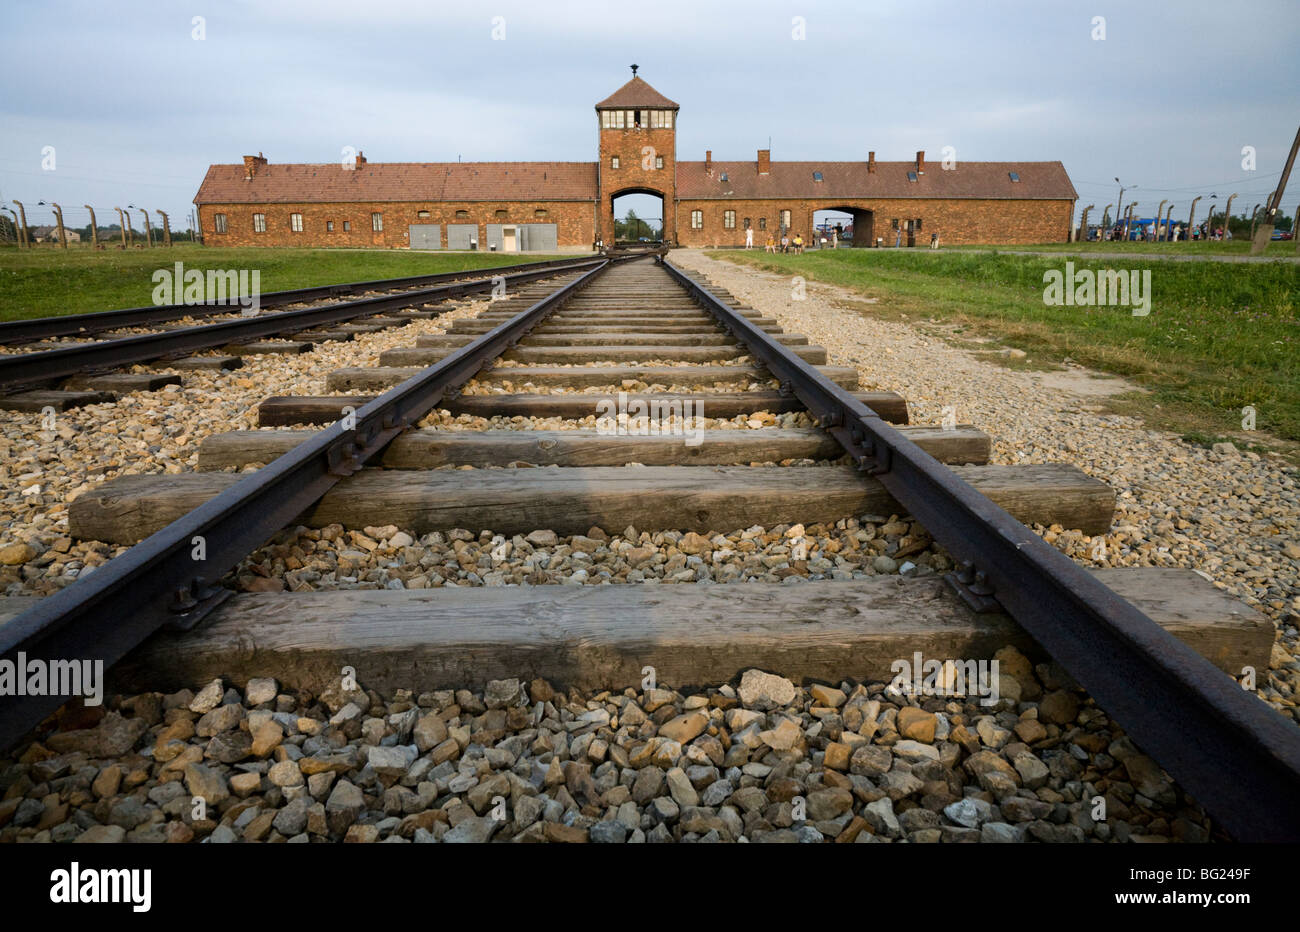 Railway lines leading inside from the main entrance at Birkenau (Auschwitz II - Birkenau) Nazi death camp in Oswiecim, - Stock Image